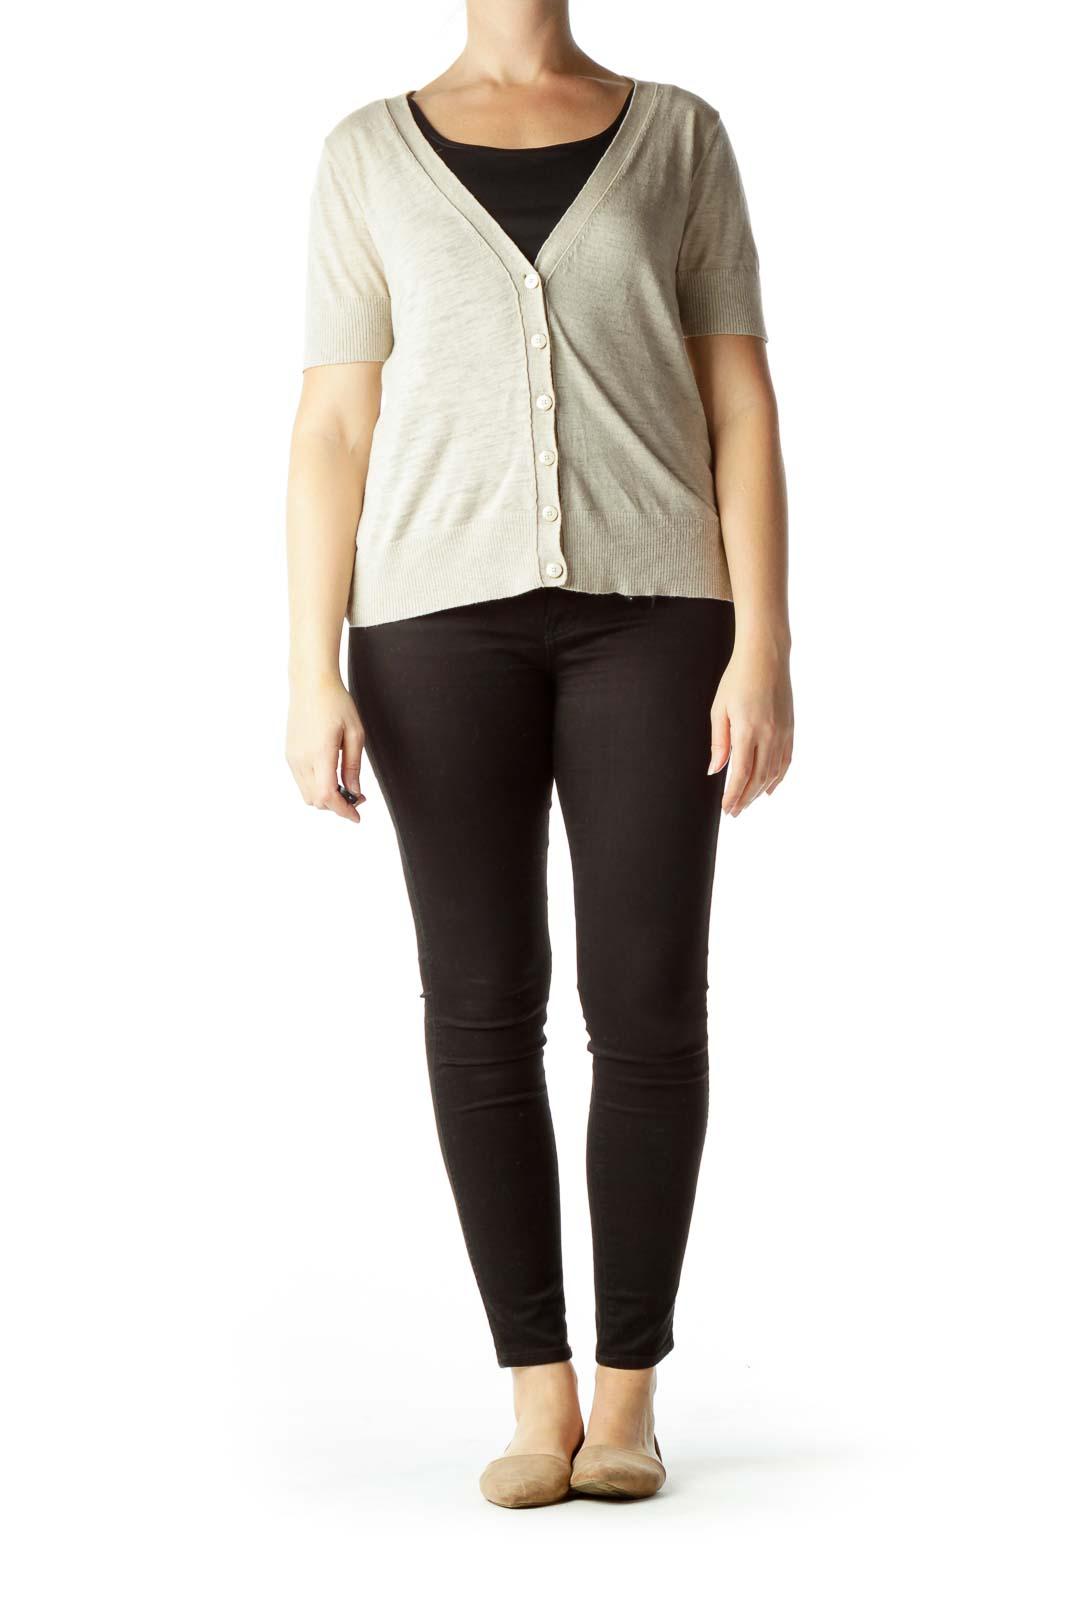 Beige 100% Cotton Short Sleeve Sweater